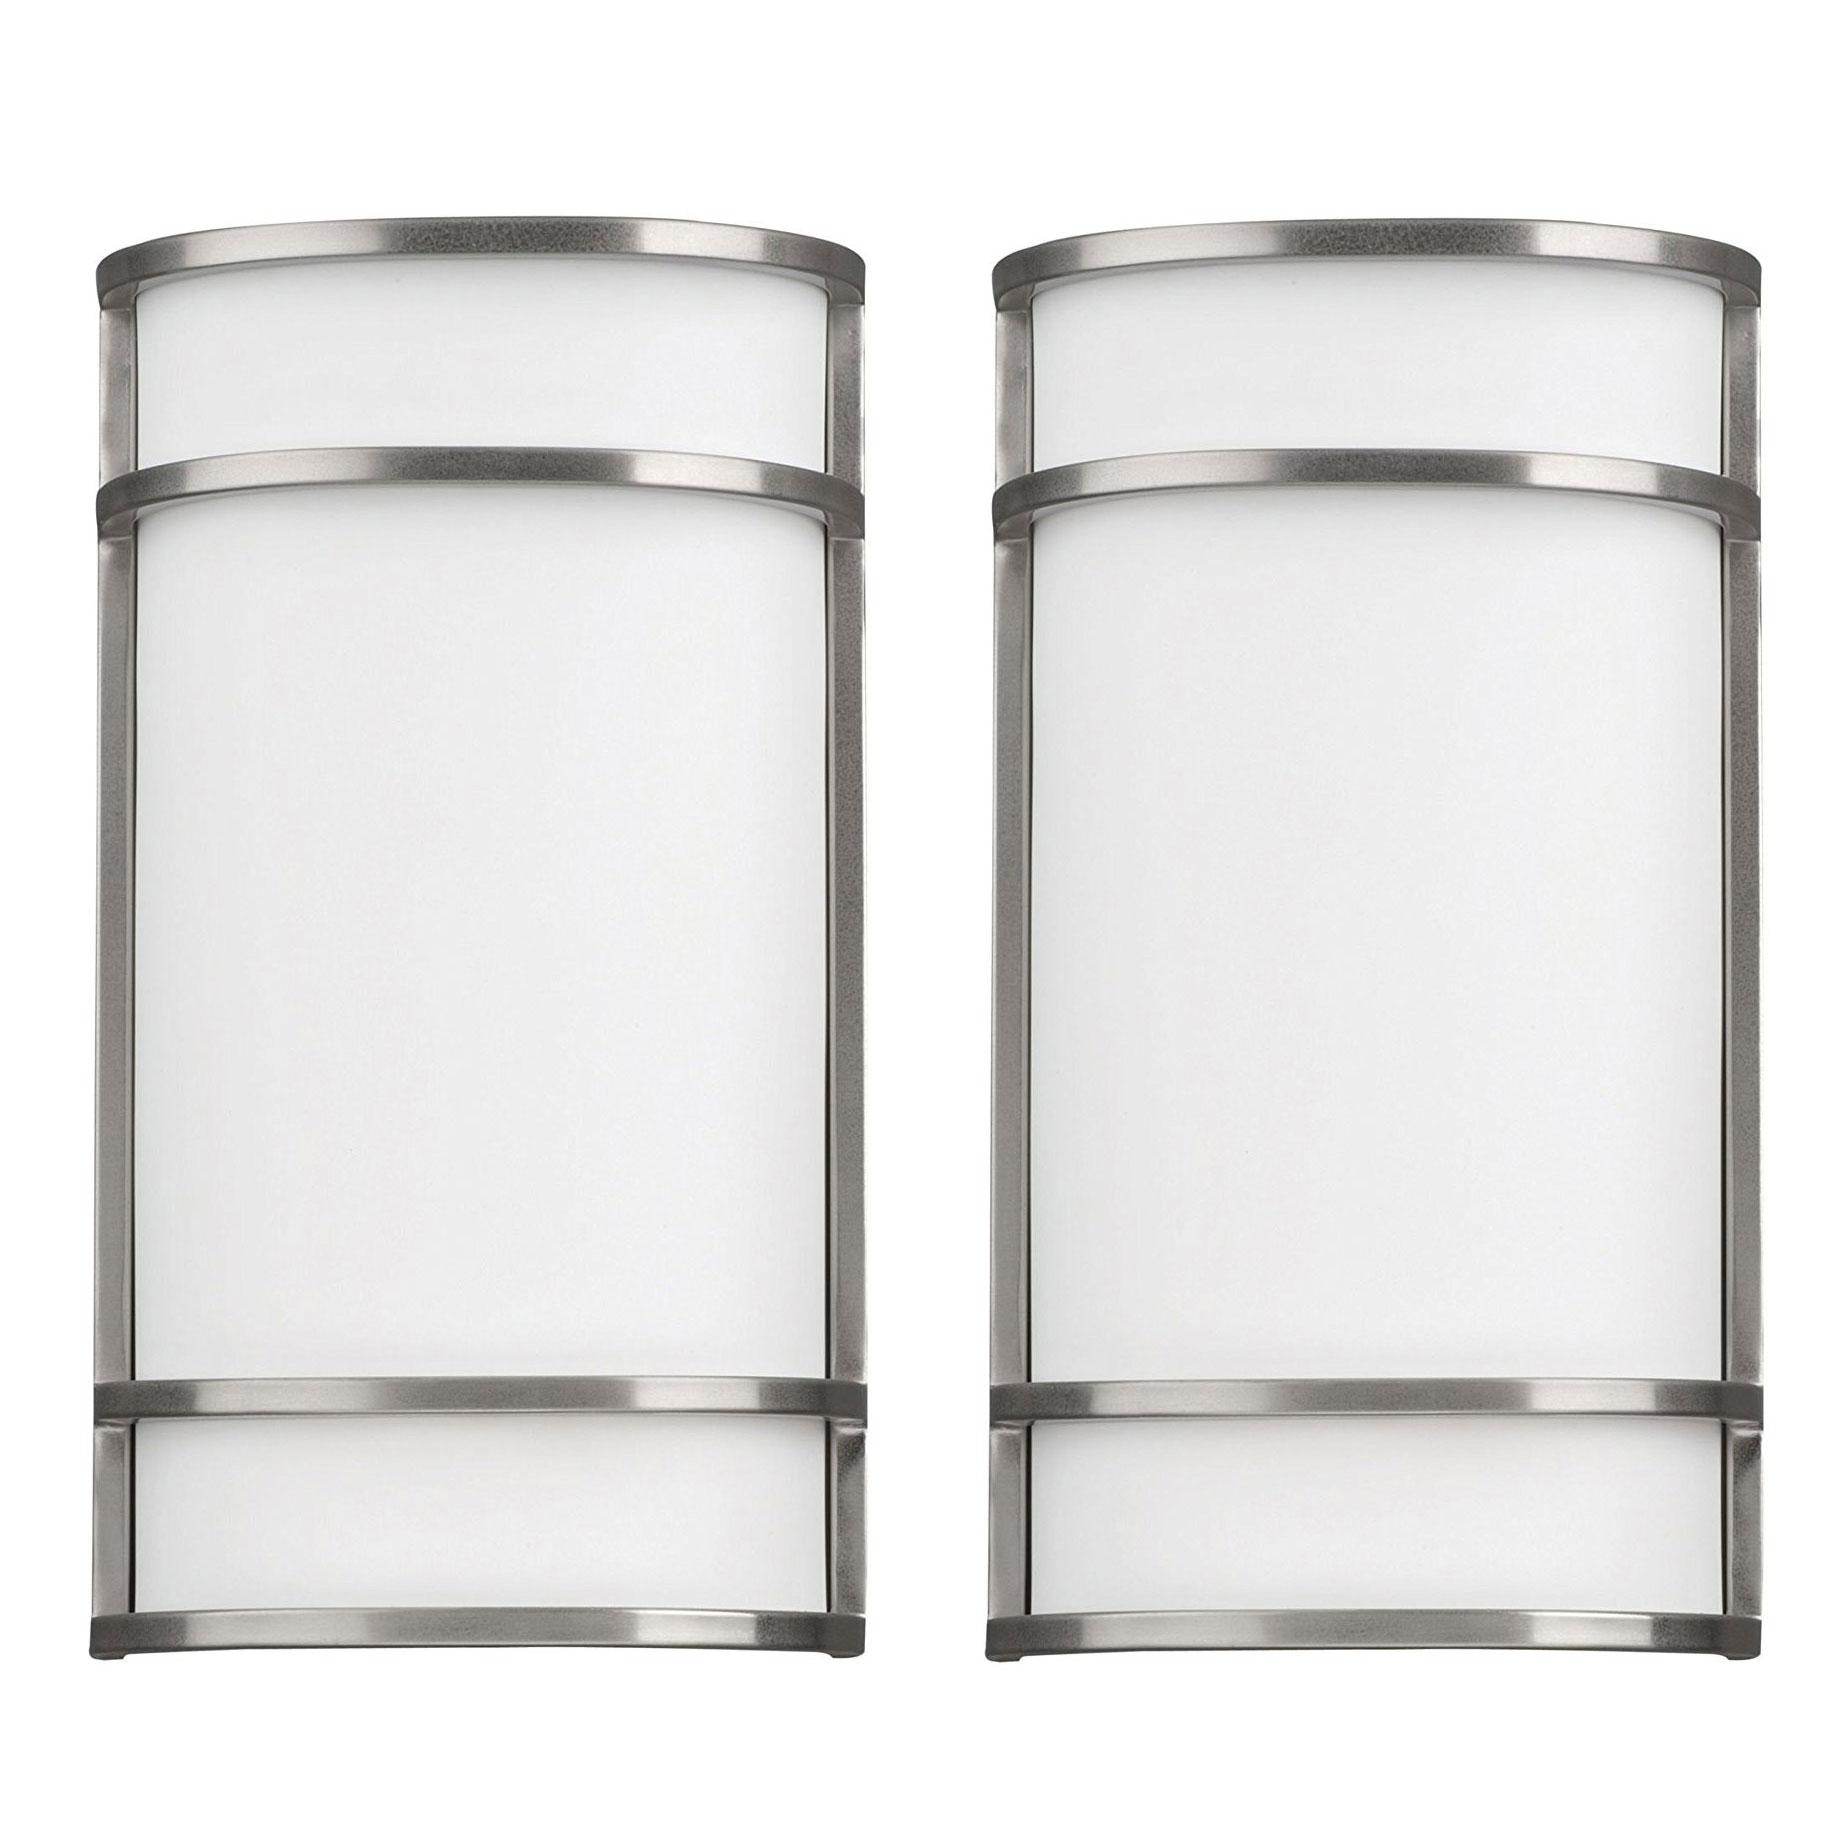 Details About Phillips Forecast Lighting Palette Bathroom Sconce Light Satin Nickel 2 Pack